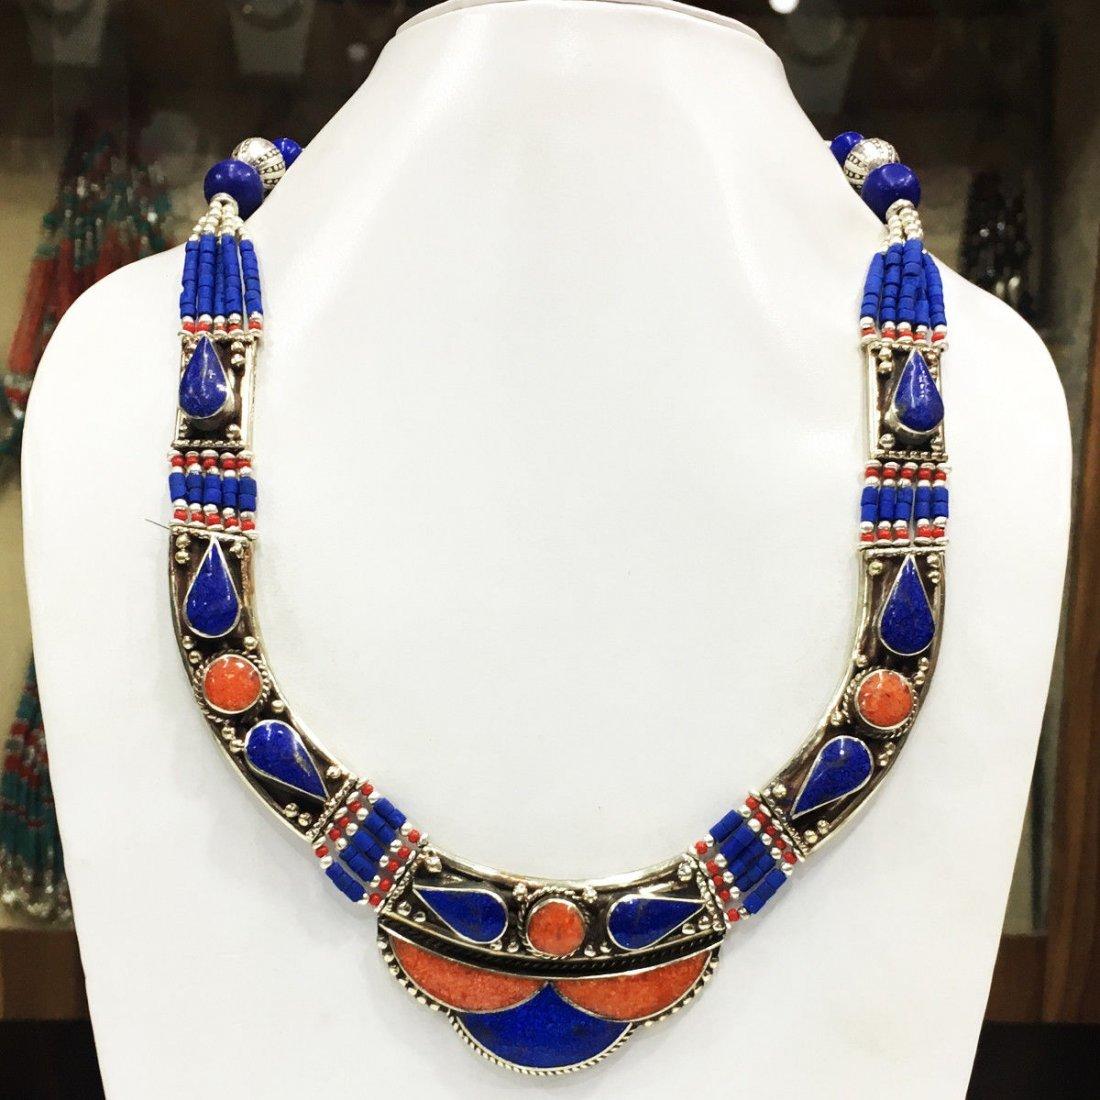 Exclusive Design - Lapis & Coral Tibetan Necklace